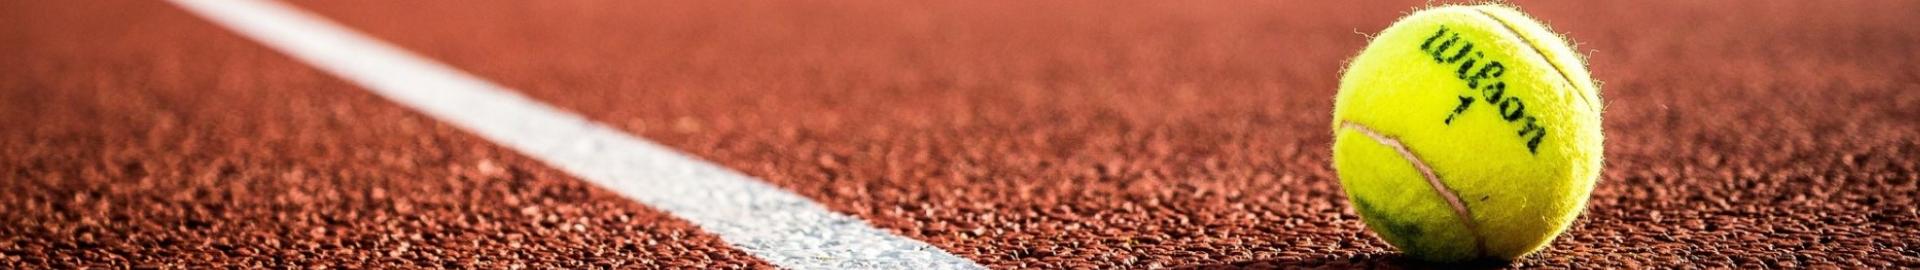 Borse e Zaini da Tennis Head/Babolat/Dunlop/Wilson | Tennis Zone Siena